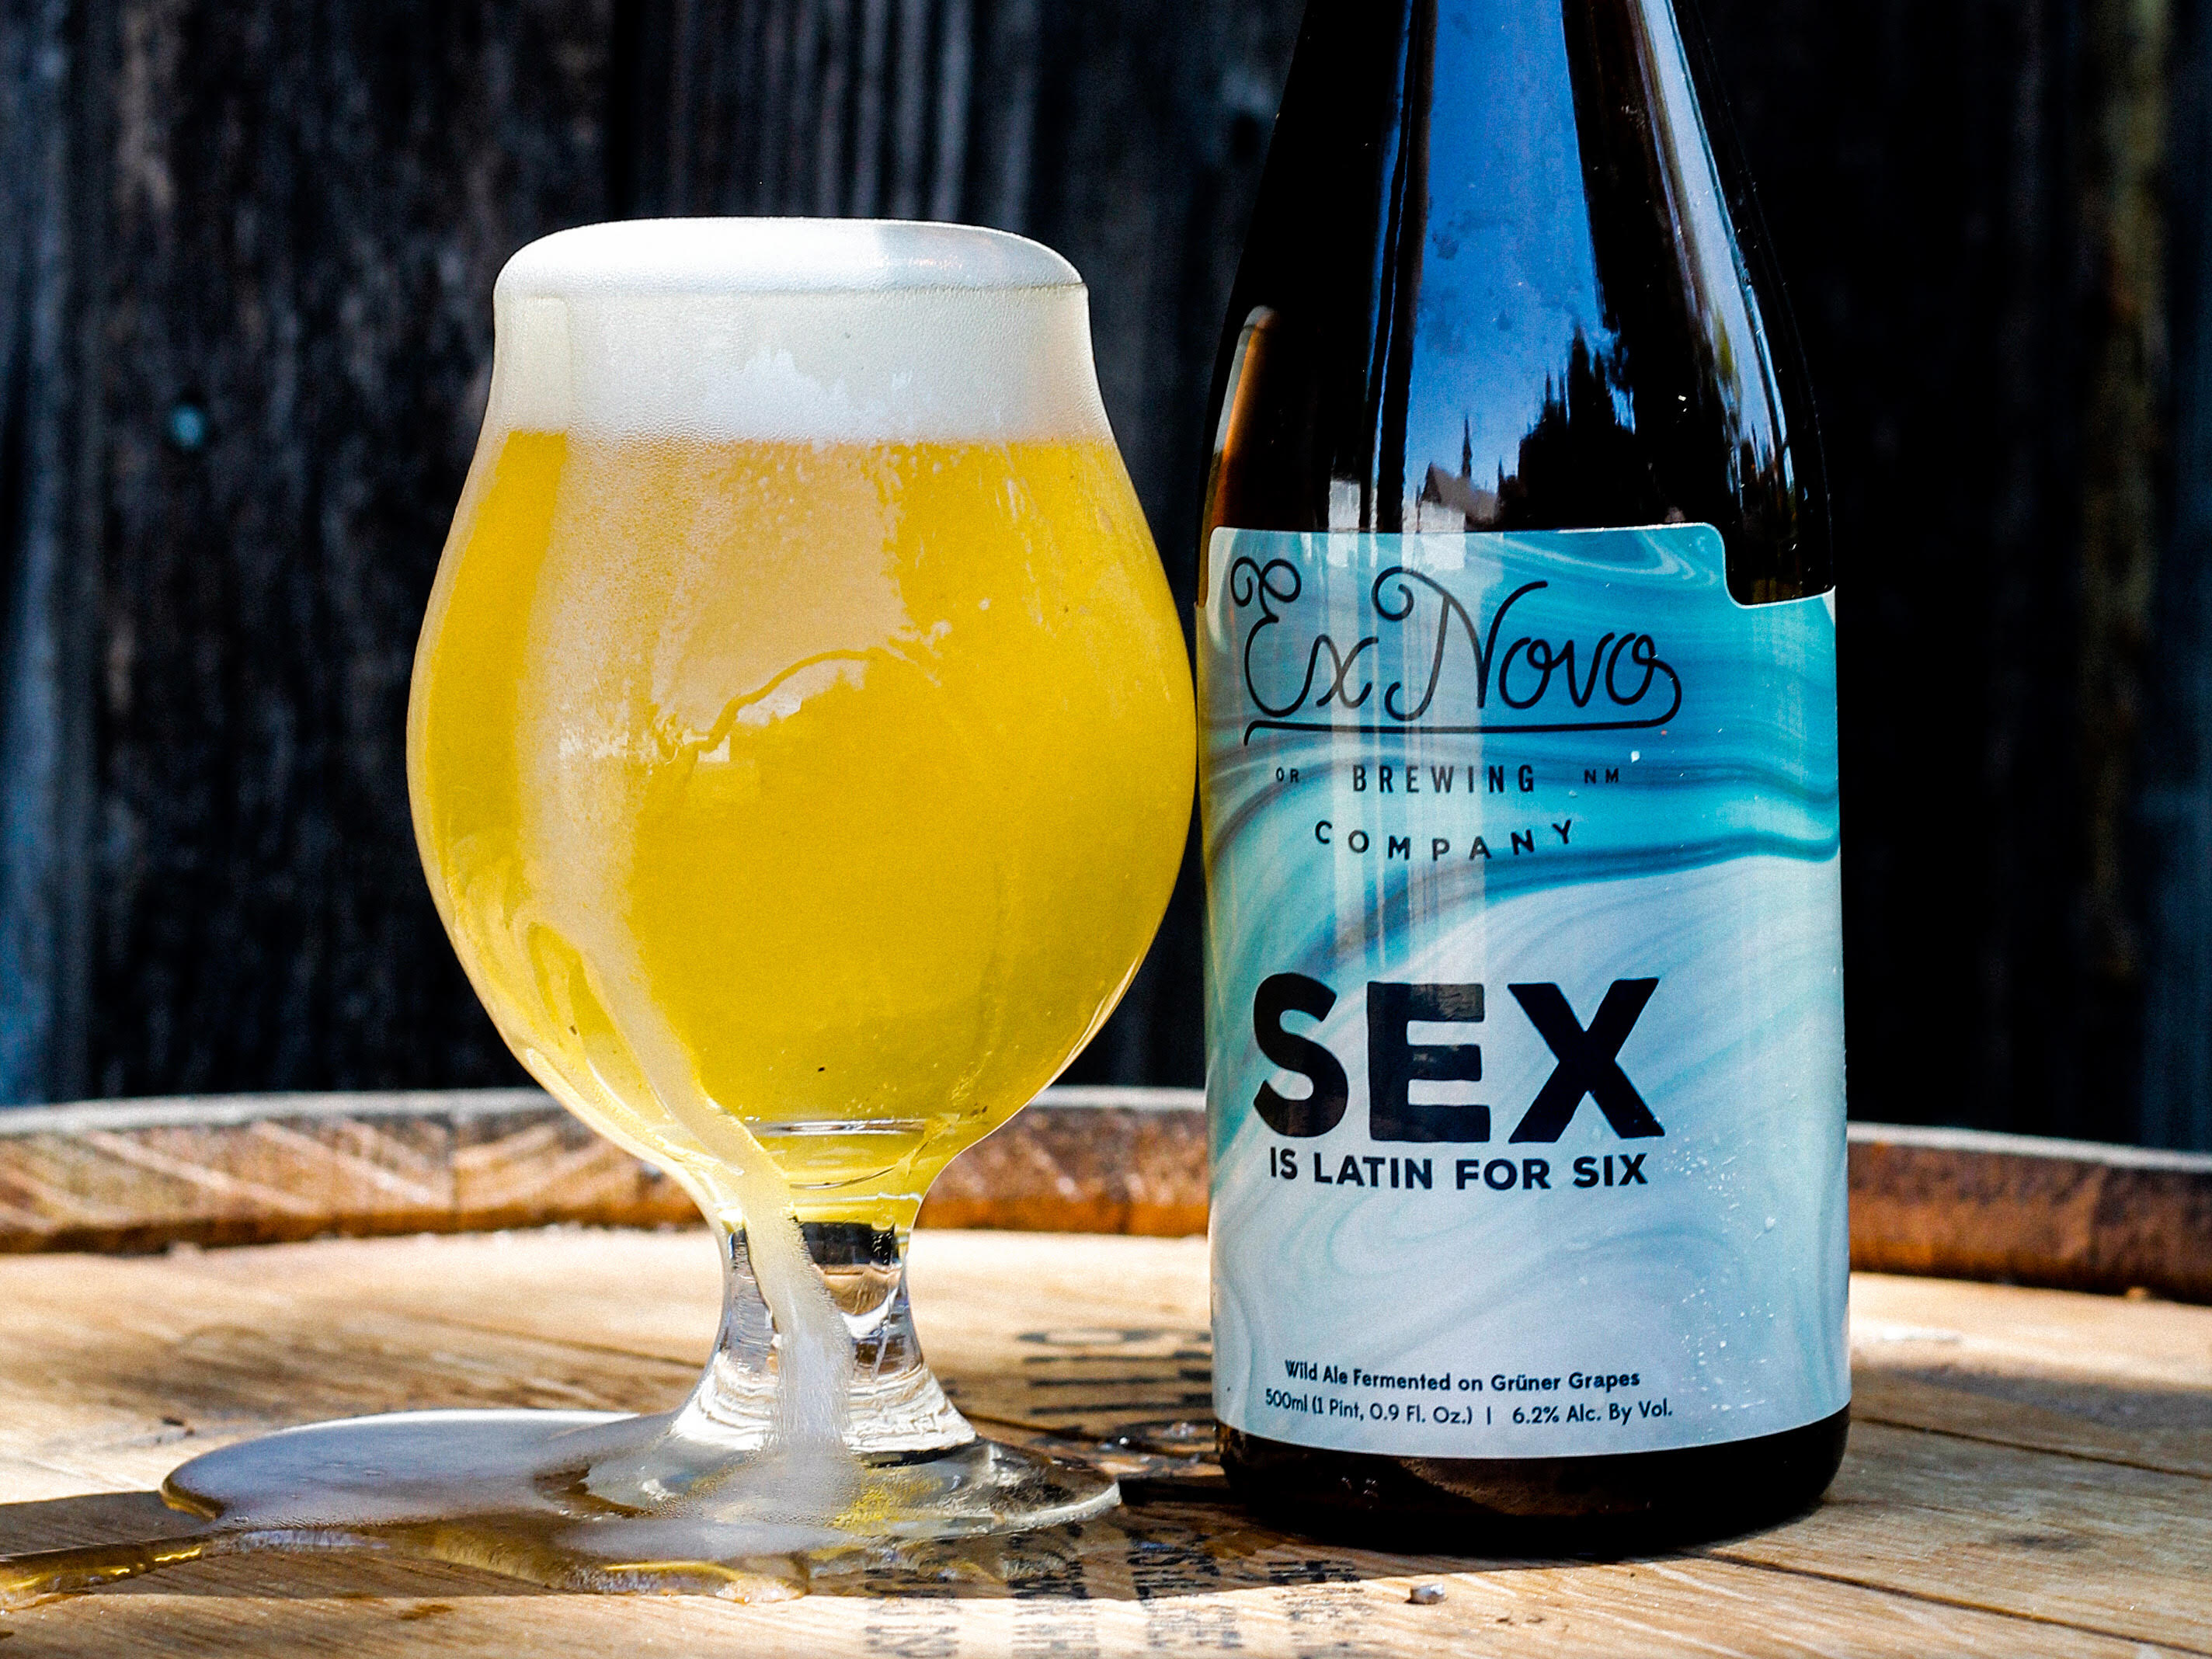 image of Sex courtesy of Ex Novo Brewing